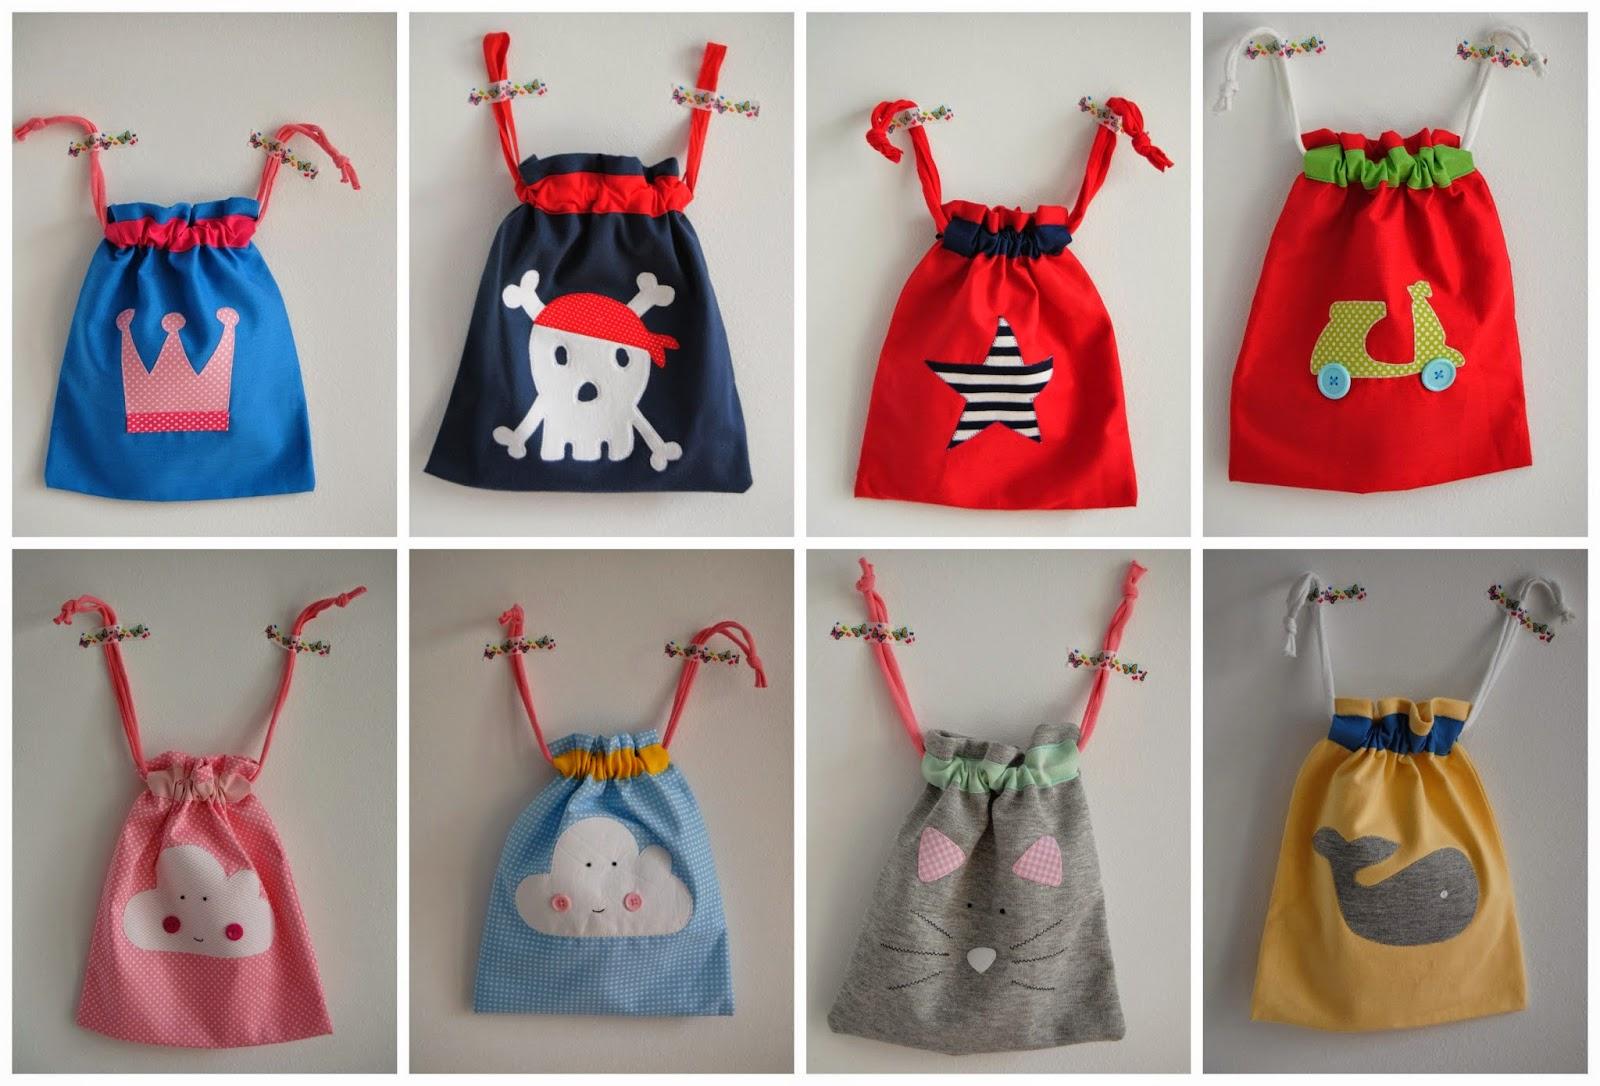 Carlotalota bolsas para la ropa del cole - Bolsas para ropa ...